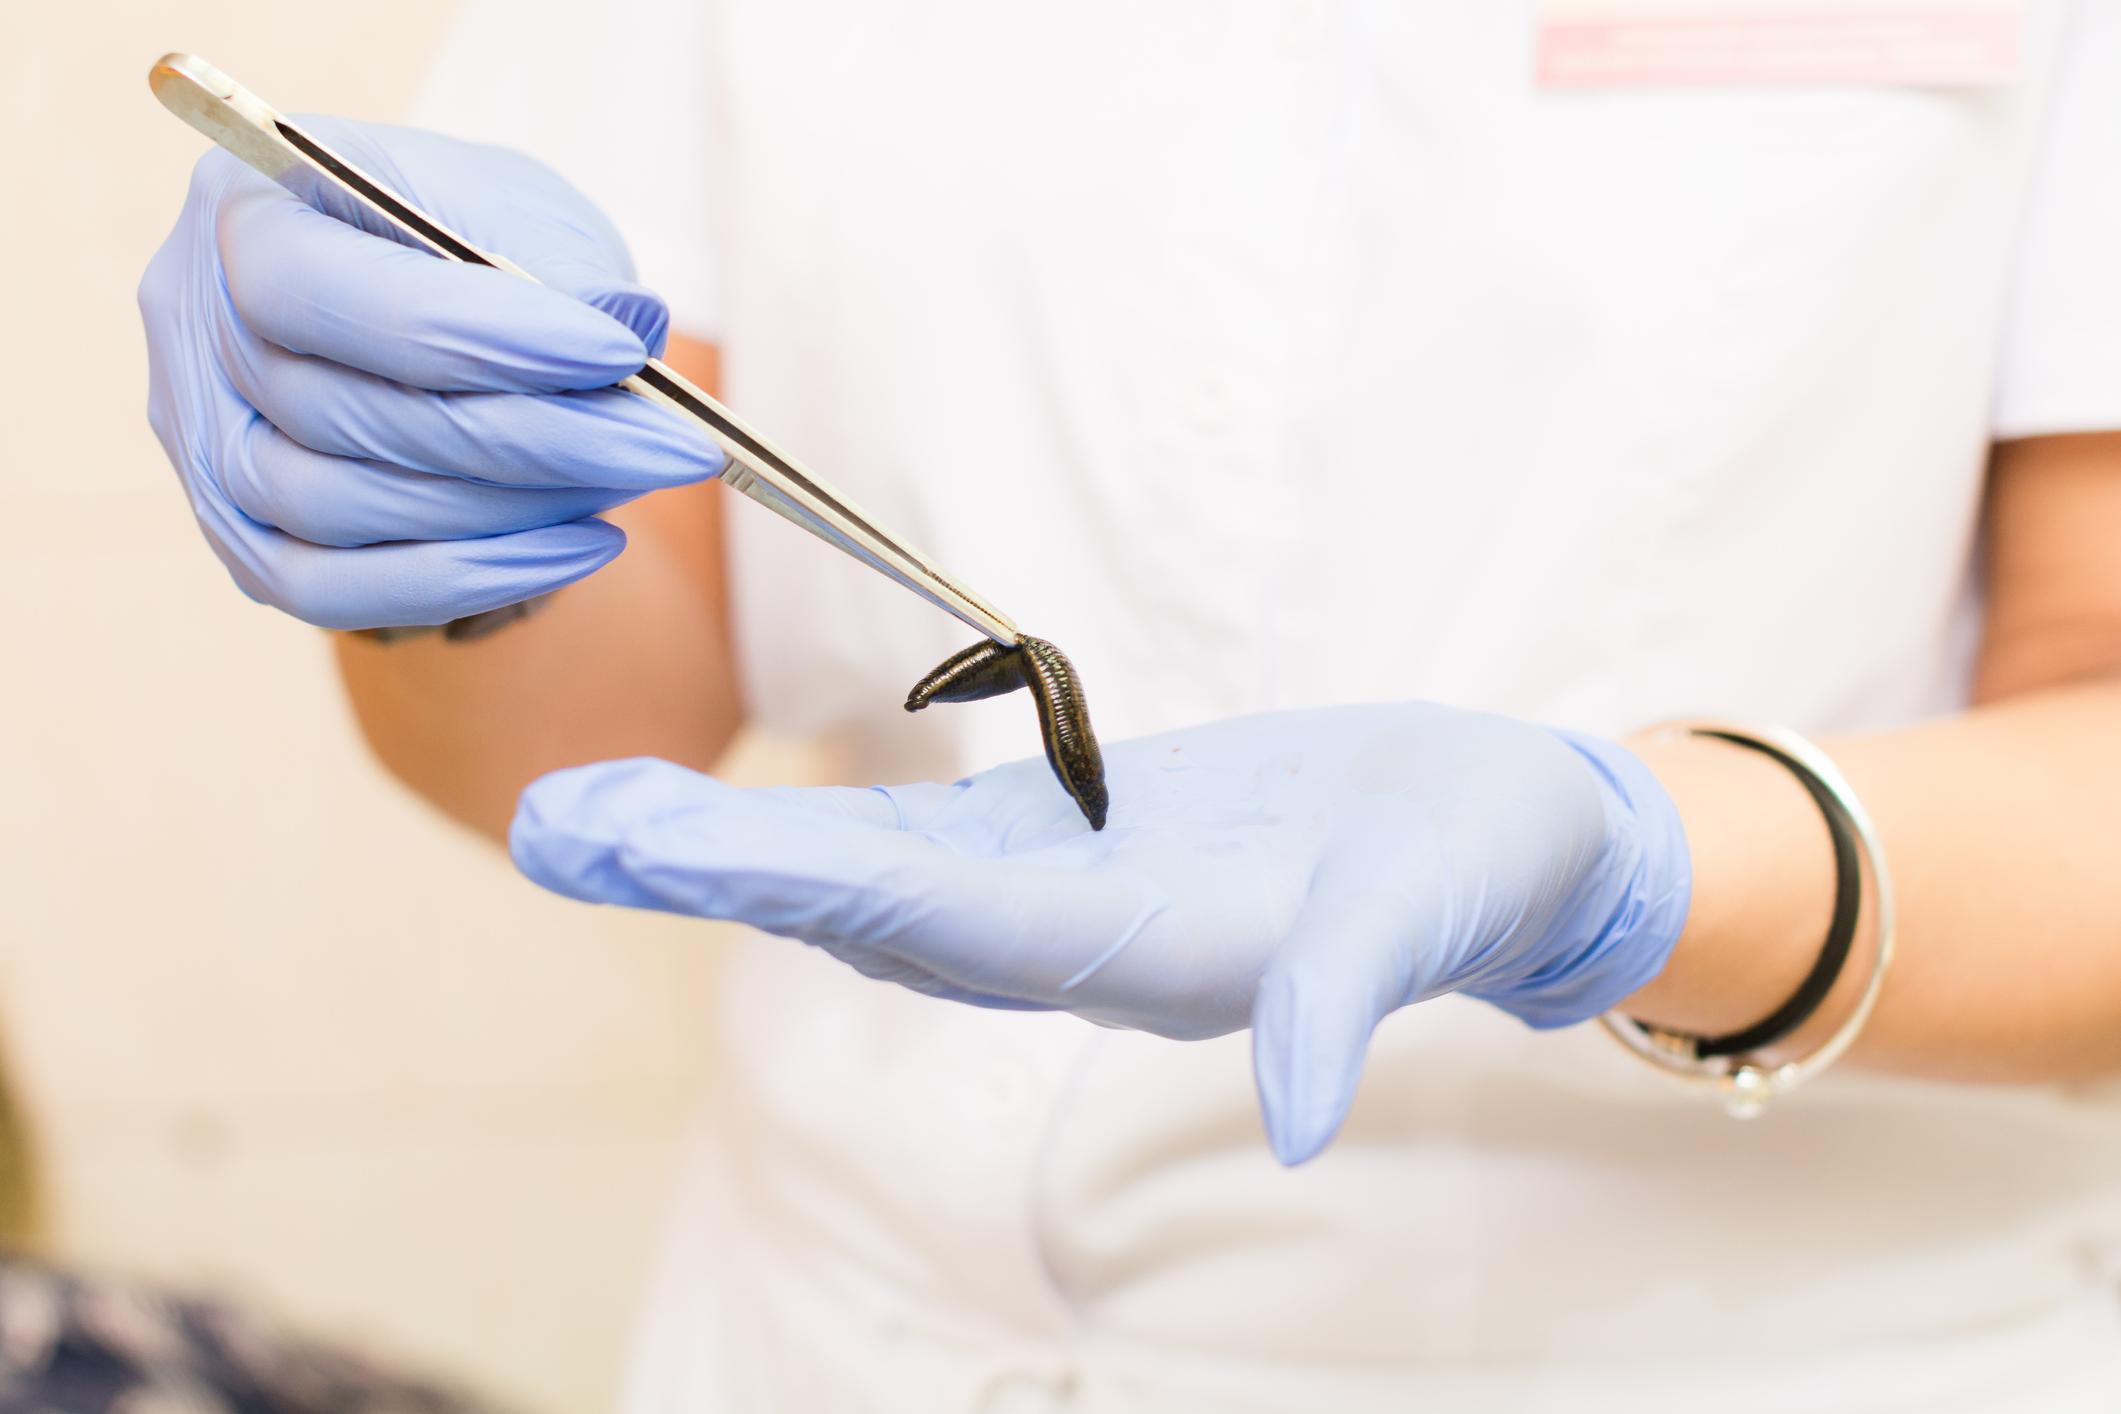 Doctor holding a medical leech